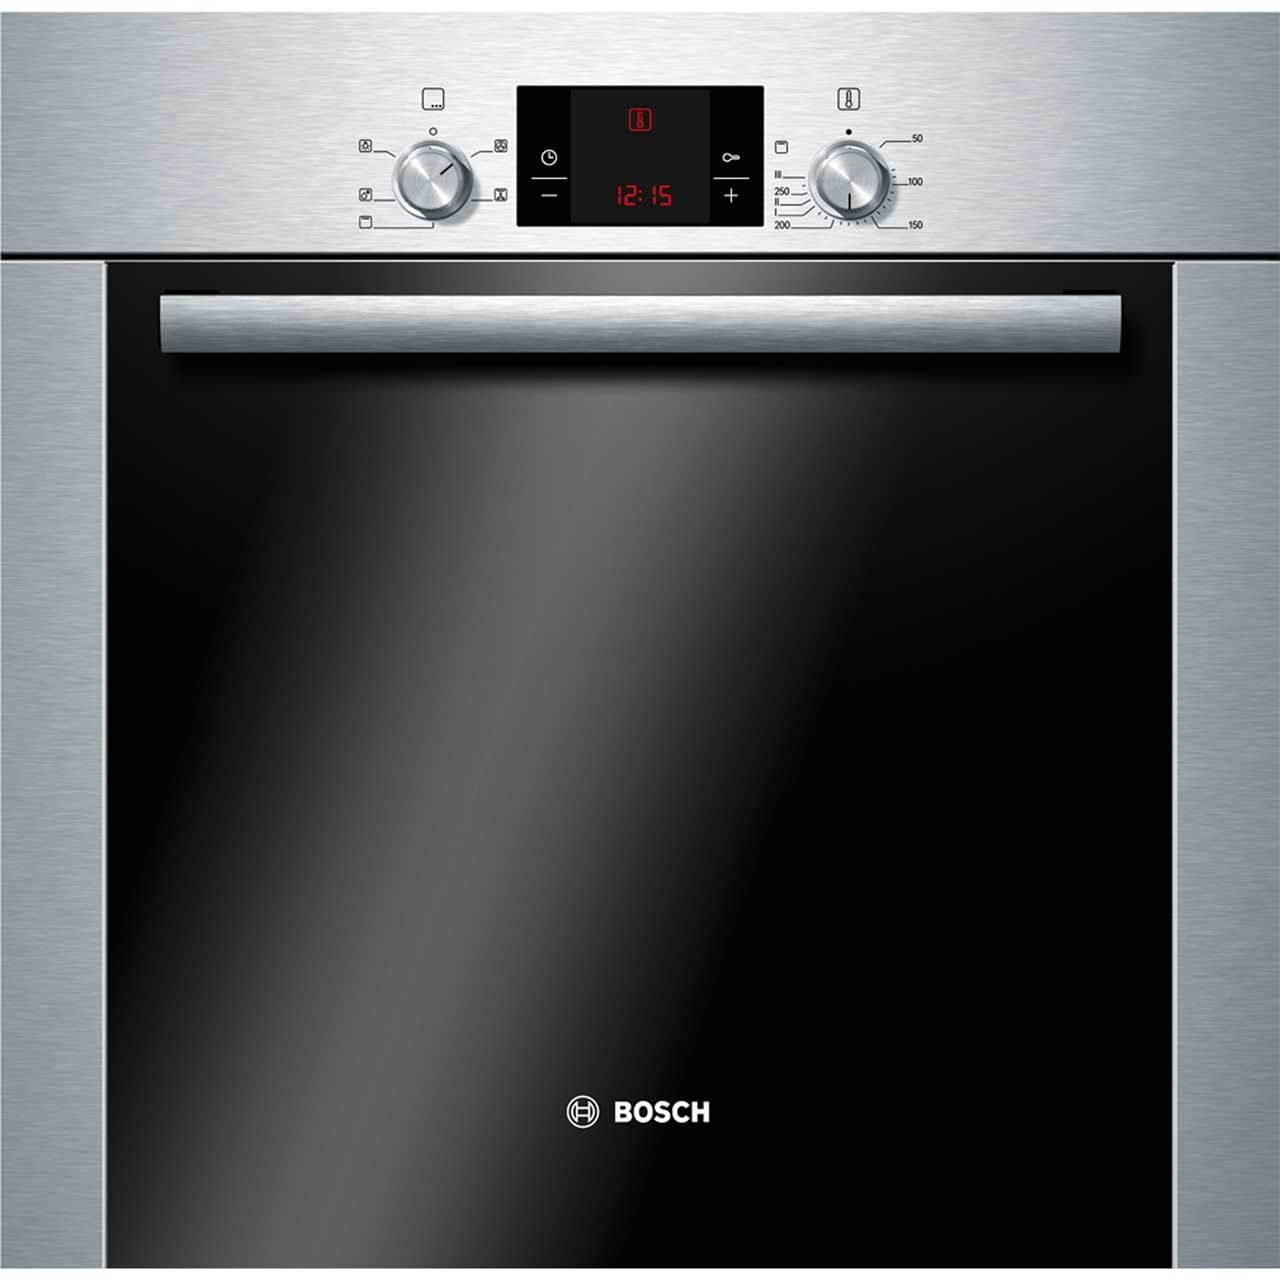 Uncategorized Bosch Integrated Kitchen Appliances 349 or a350 bosch serie 6 hba13b253b built in electric single a349 oven